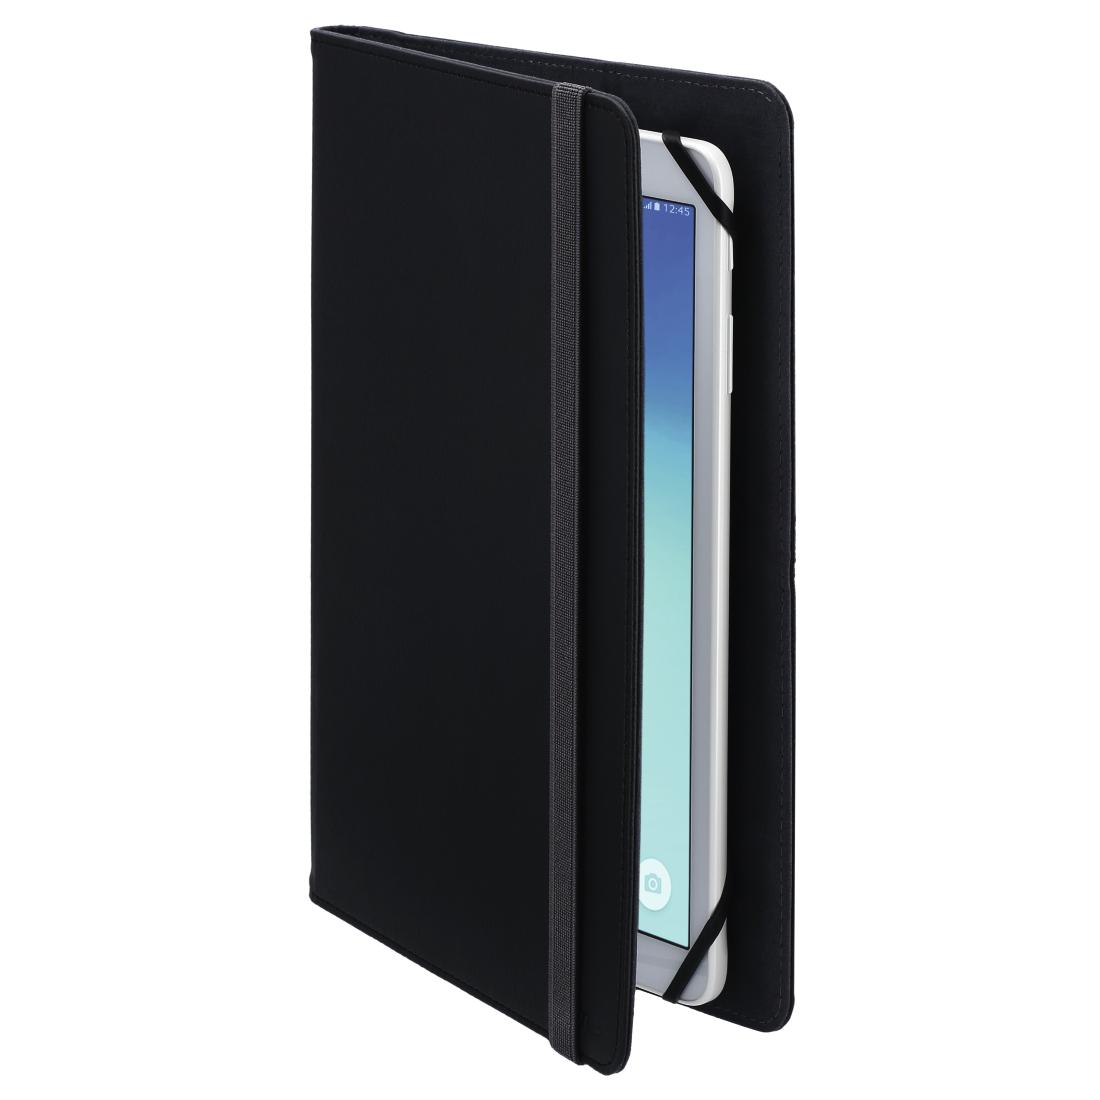 Pleasing 00101926 Hama Tablet Case 3600 Rotation Uni Fur Tablets 22 Download Free Architecture Designs Itiscsunscenecom